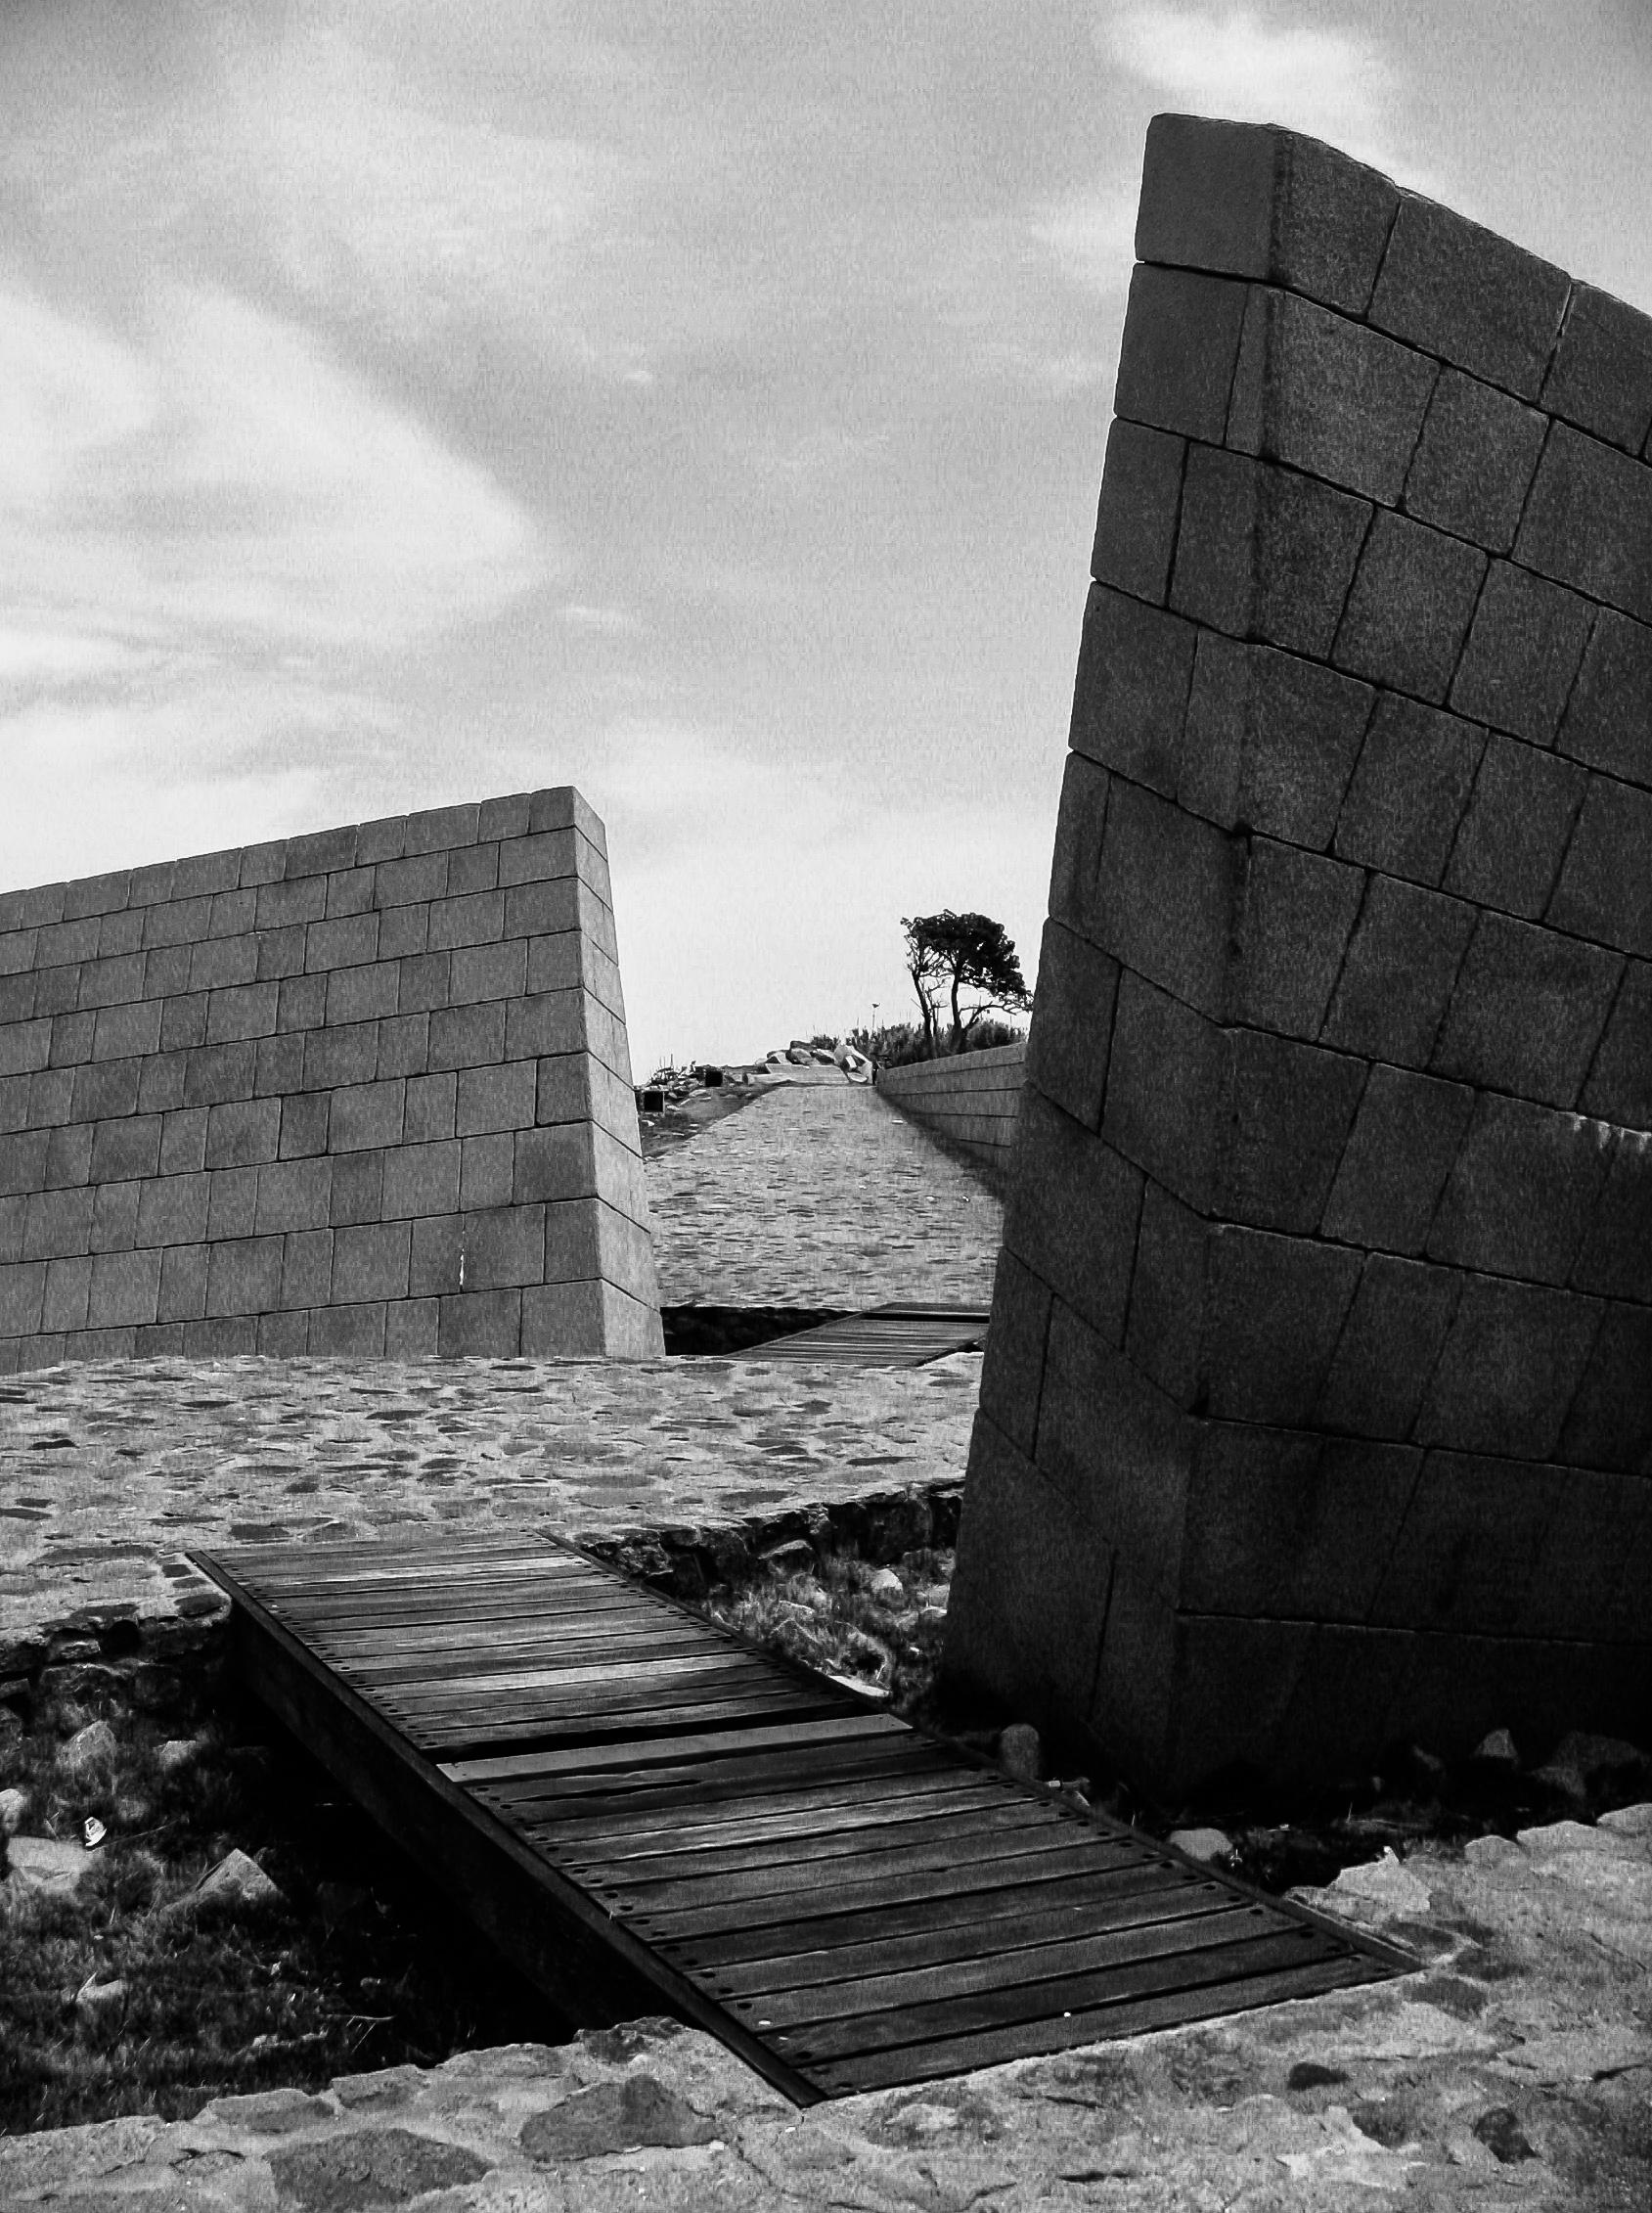 montevideo-6564_sloping-brick-wall-passage.jpg